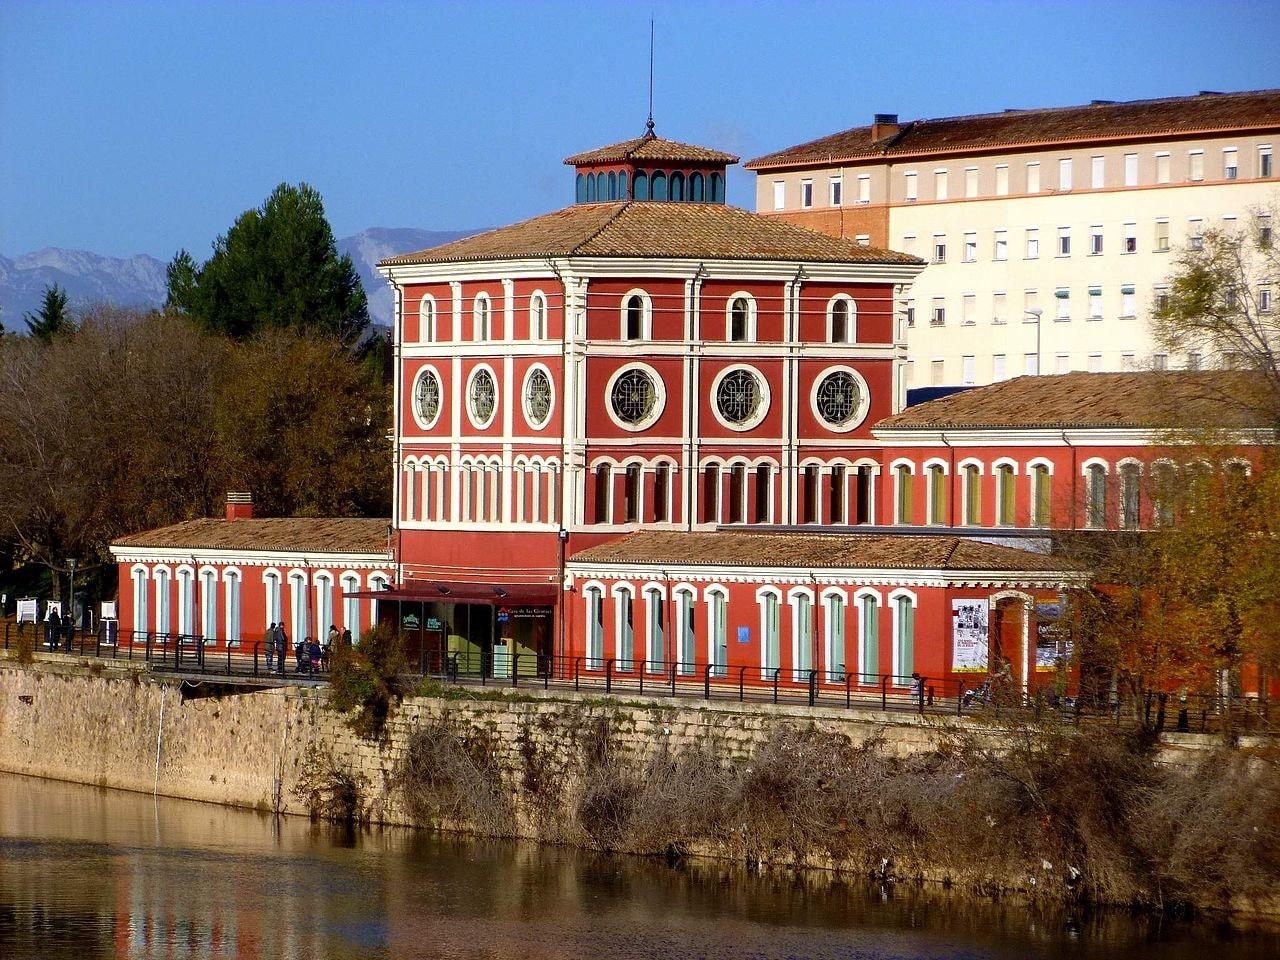 Casa de las Ciencias, Logroño, Spain | ©Zarateman / wikimedia Commons